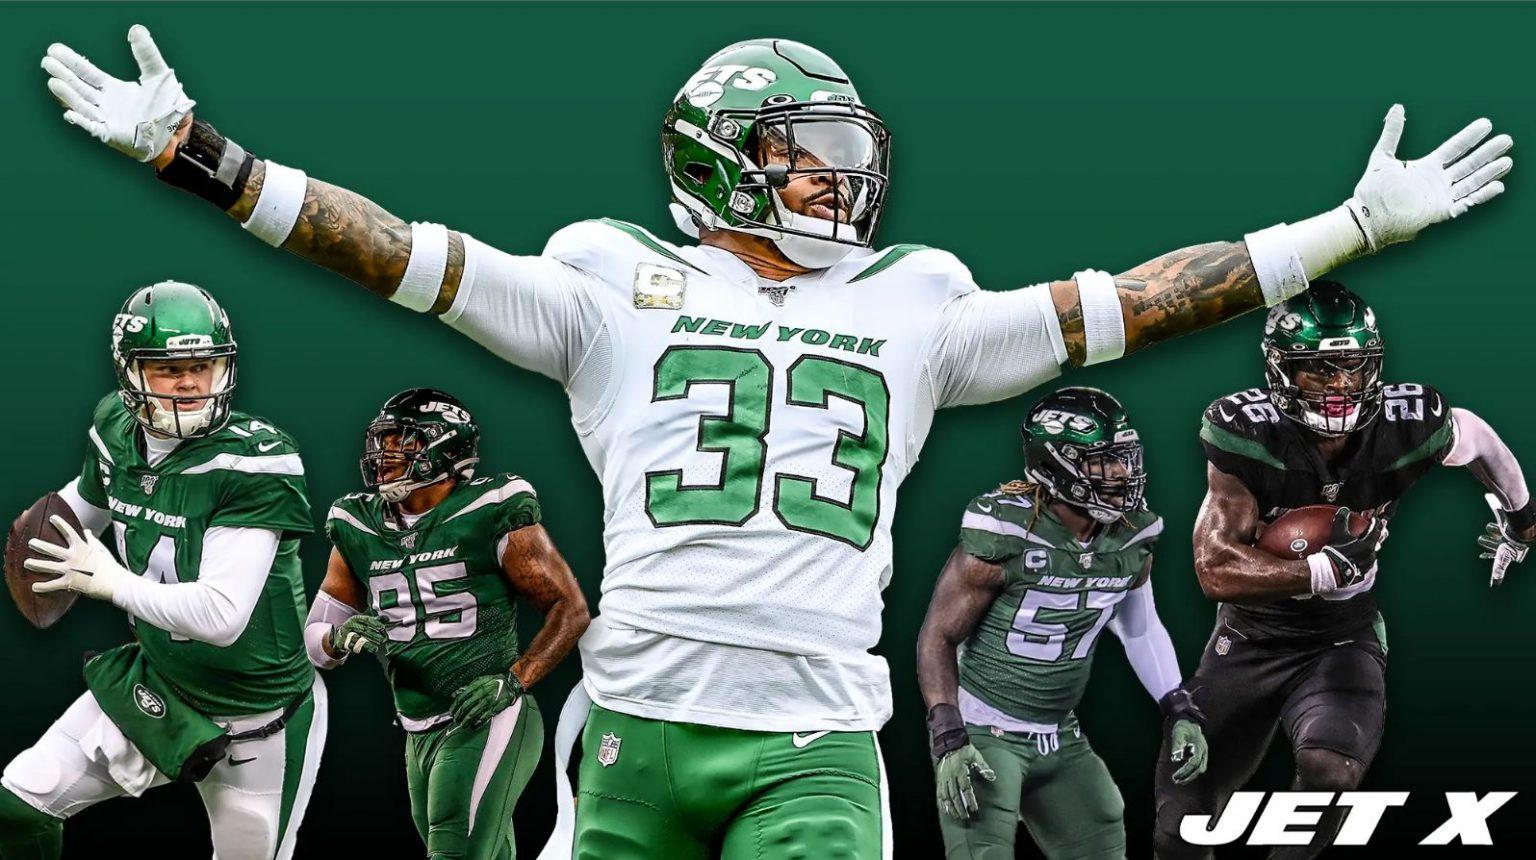 Newyork Jets